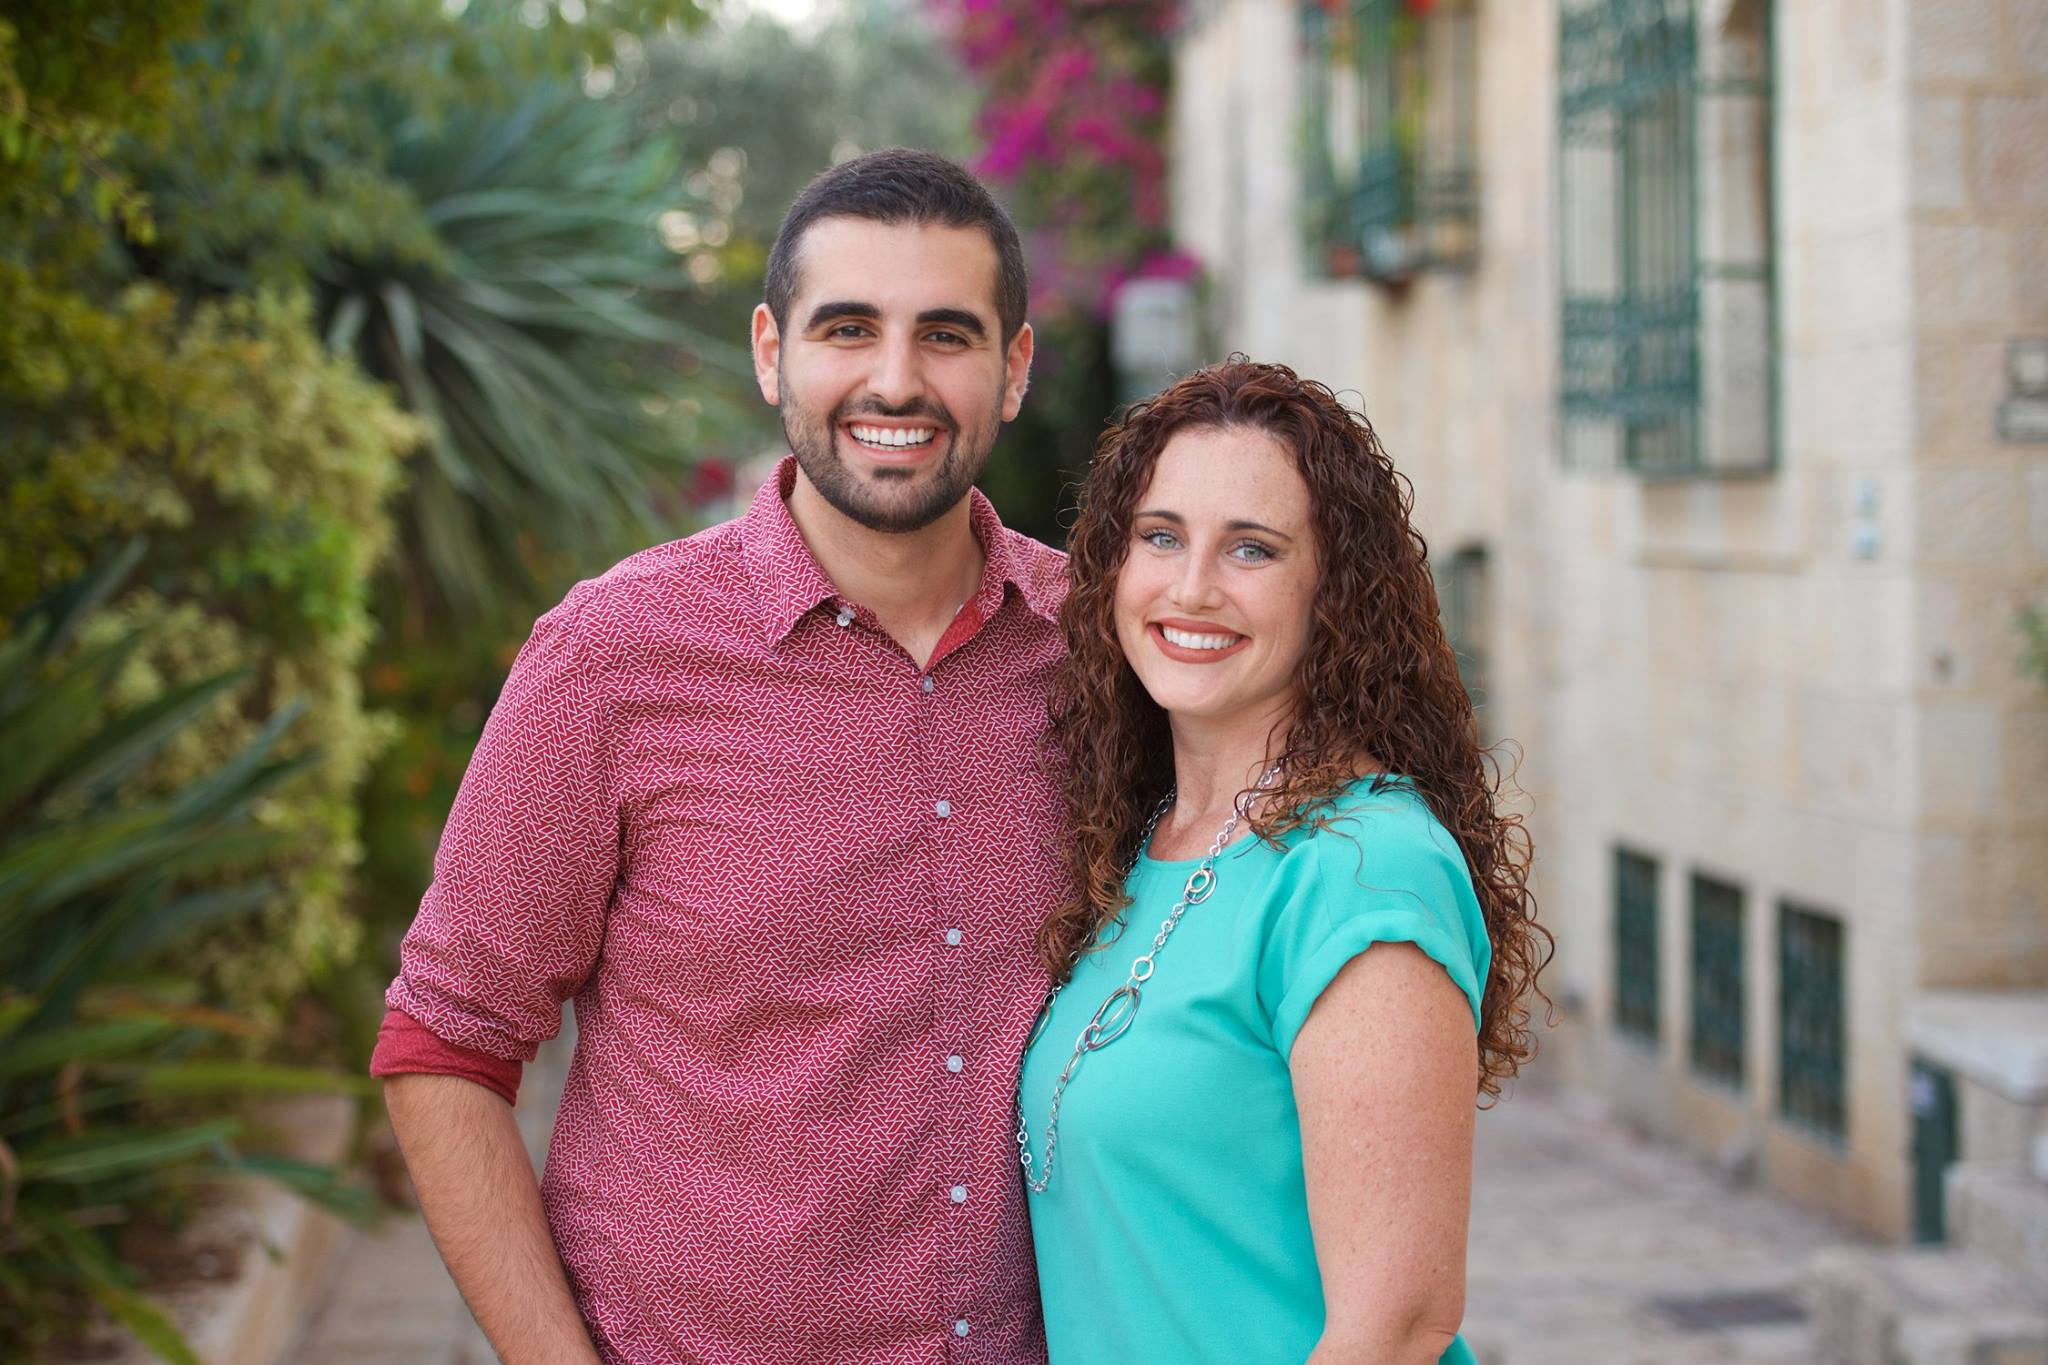 Michael and Vanessa Mistretta